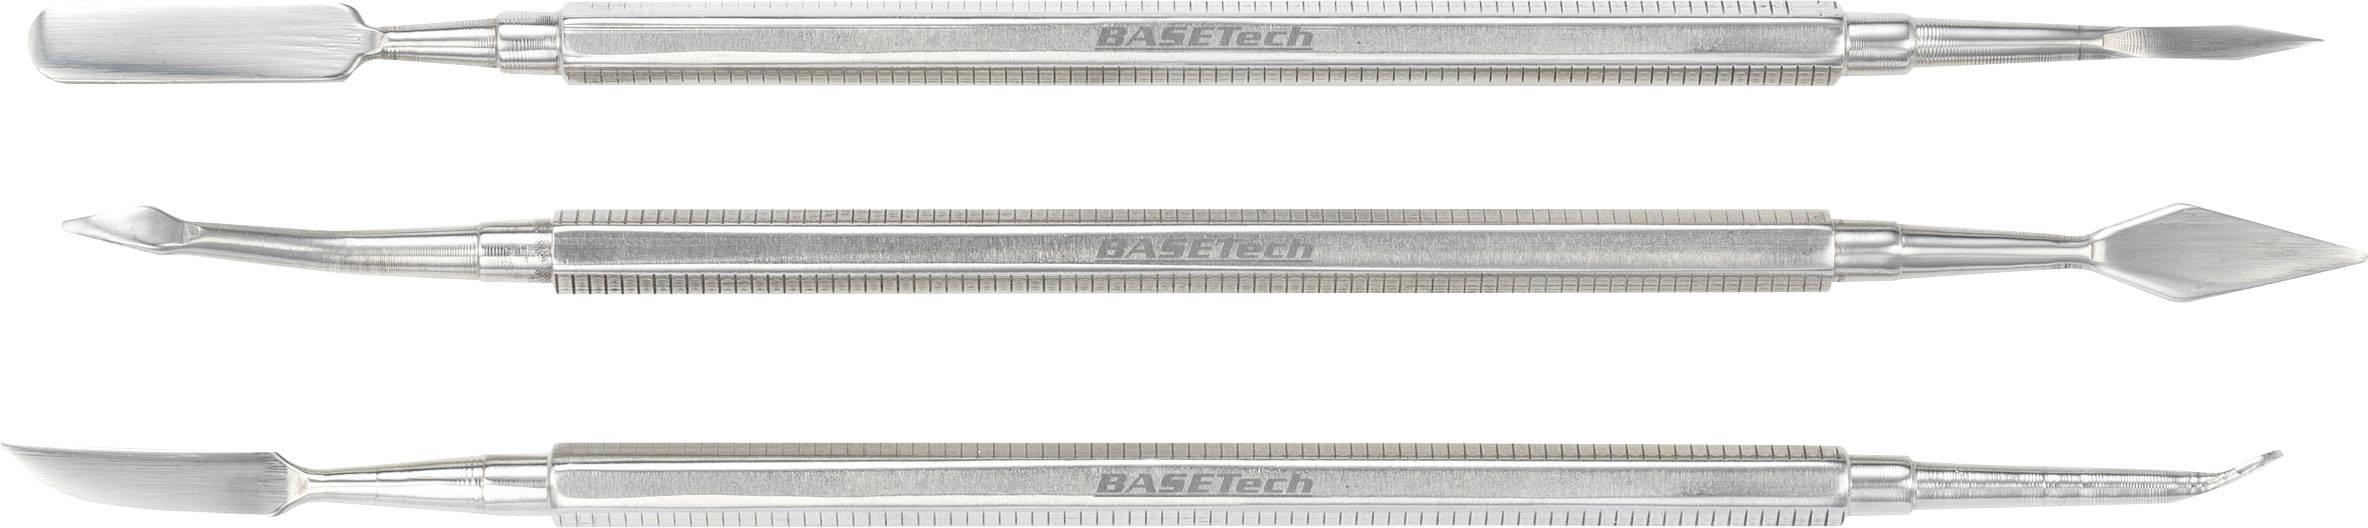 Sada modelovacích nástrojov Basetech MER-545033